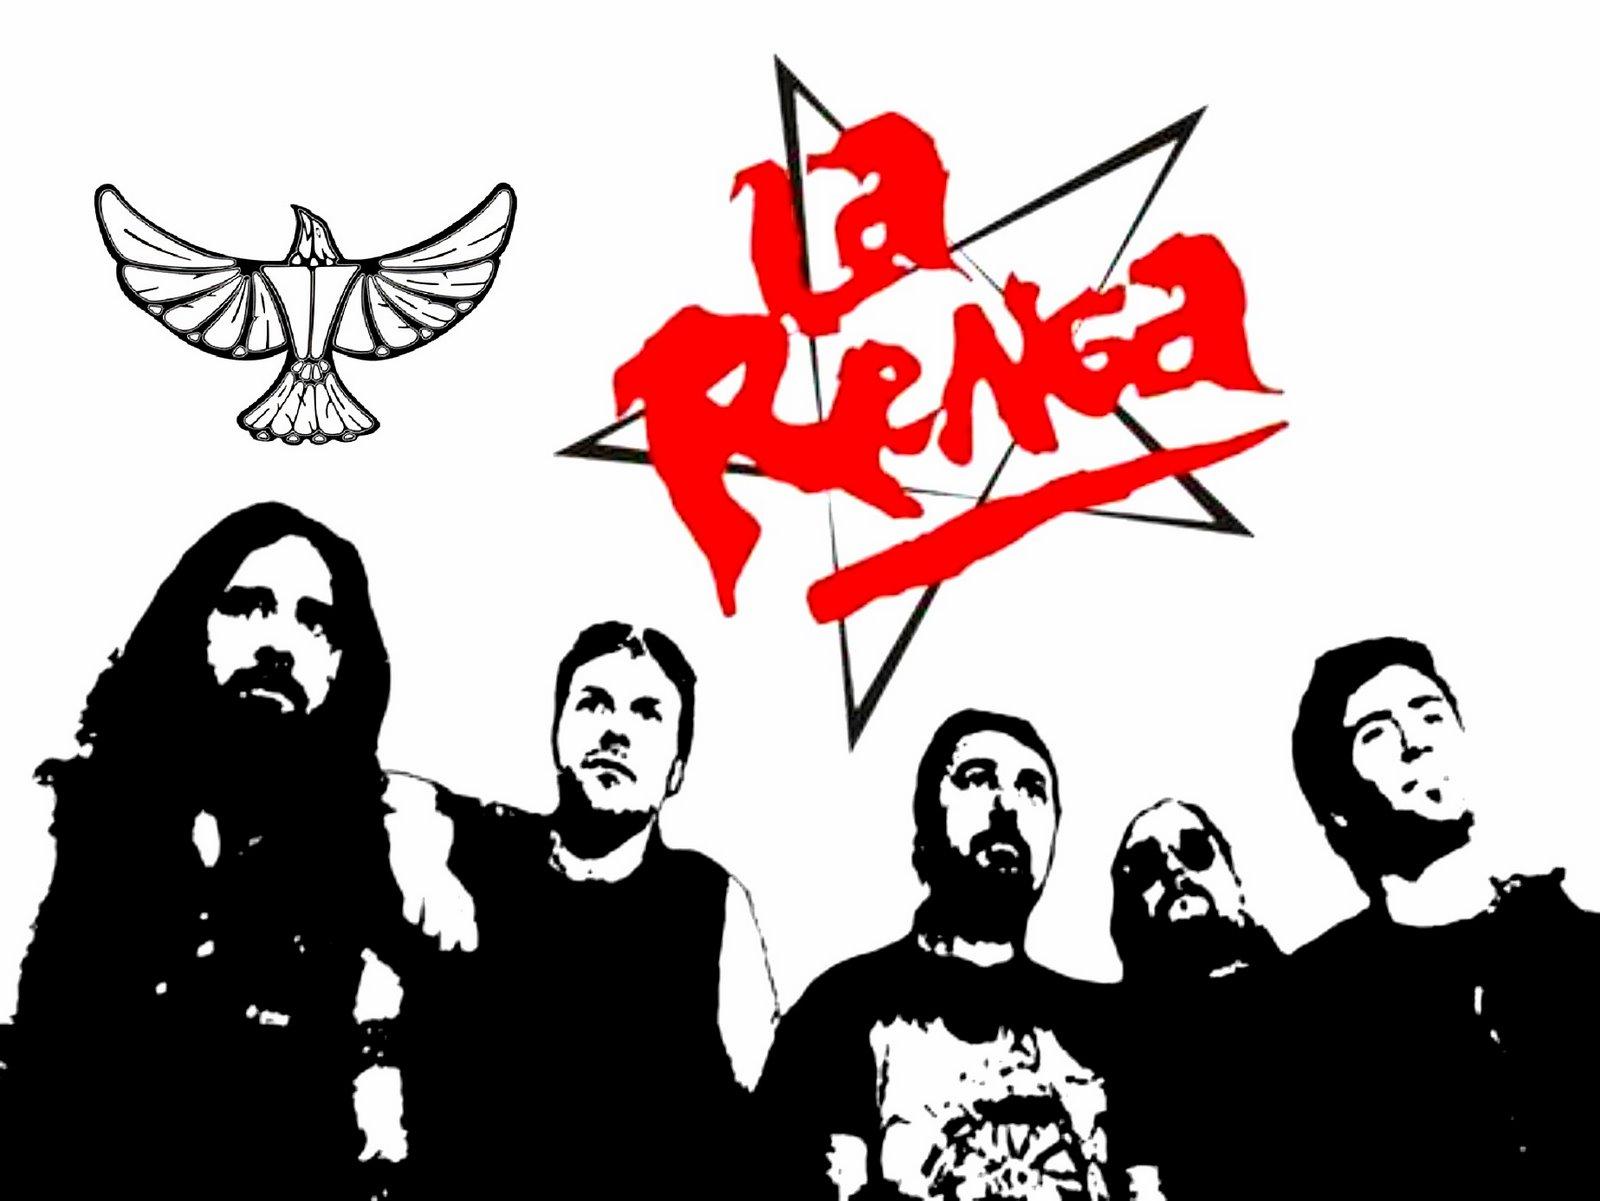 Images of La Renga | 1600x1201